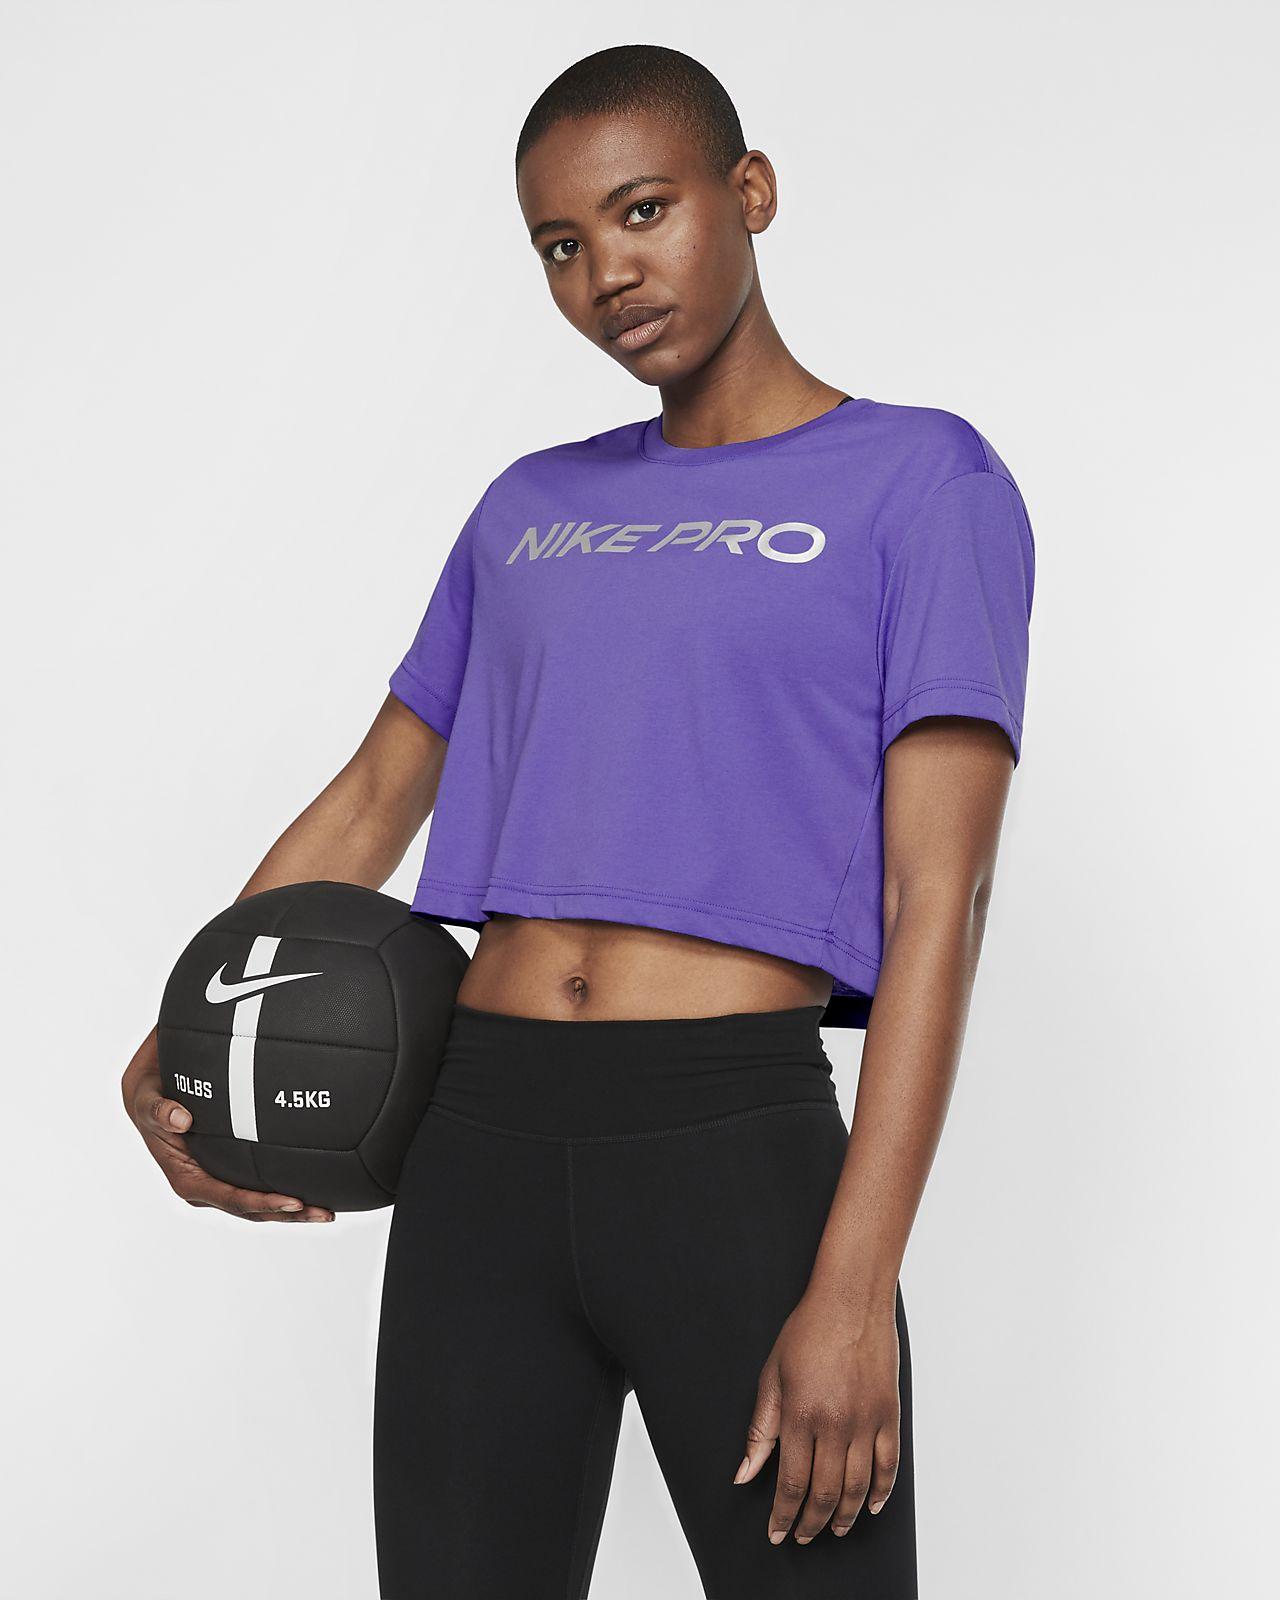 Nike Dri-FIT Trainings-T-Shirt für Damen